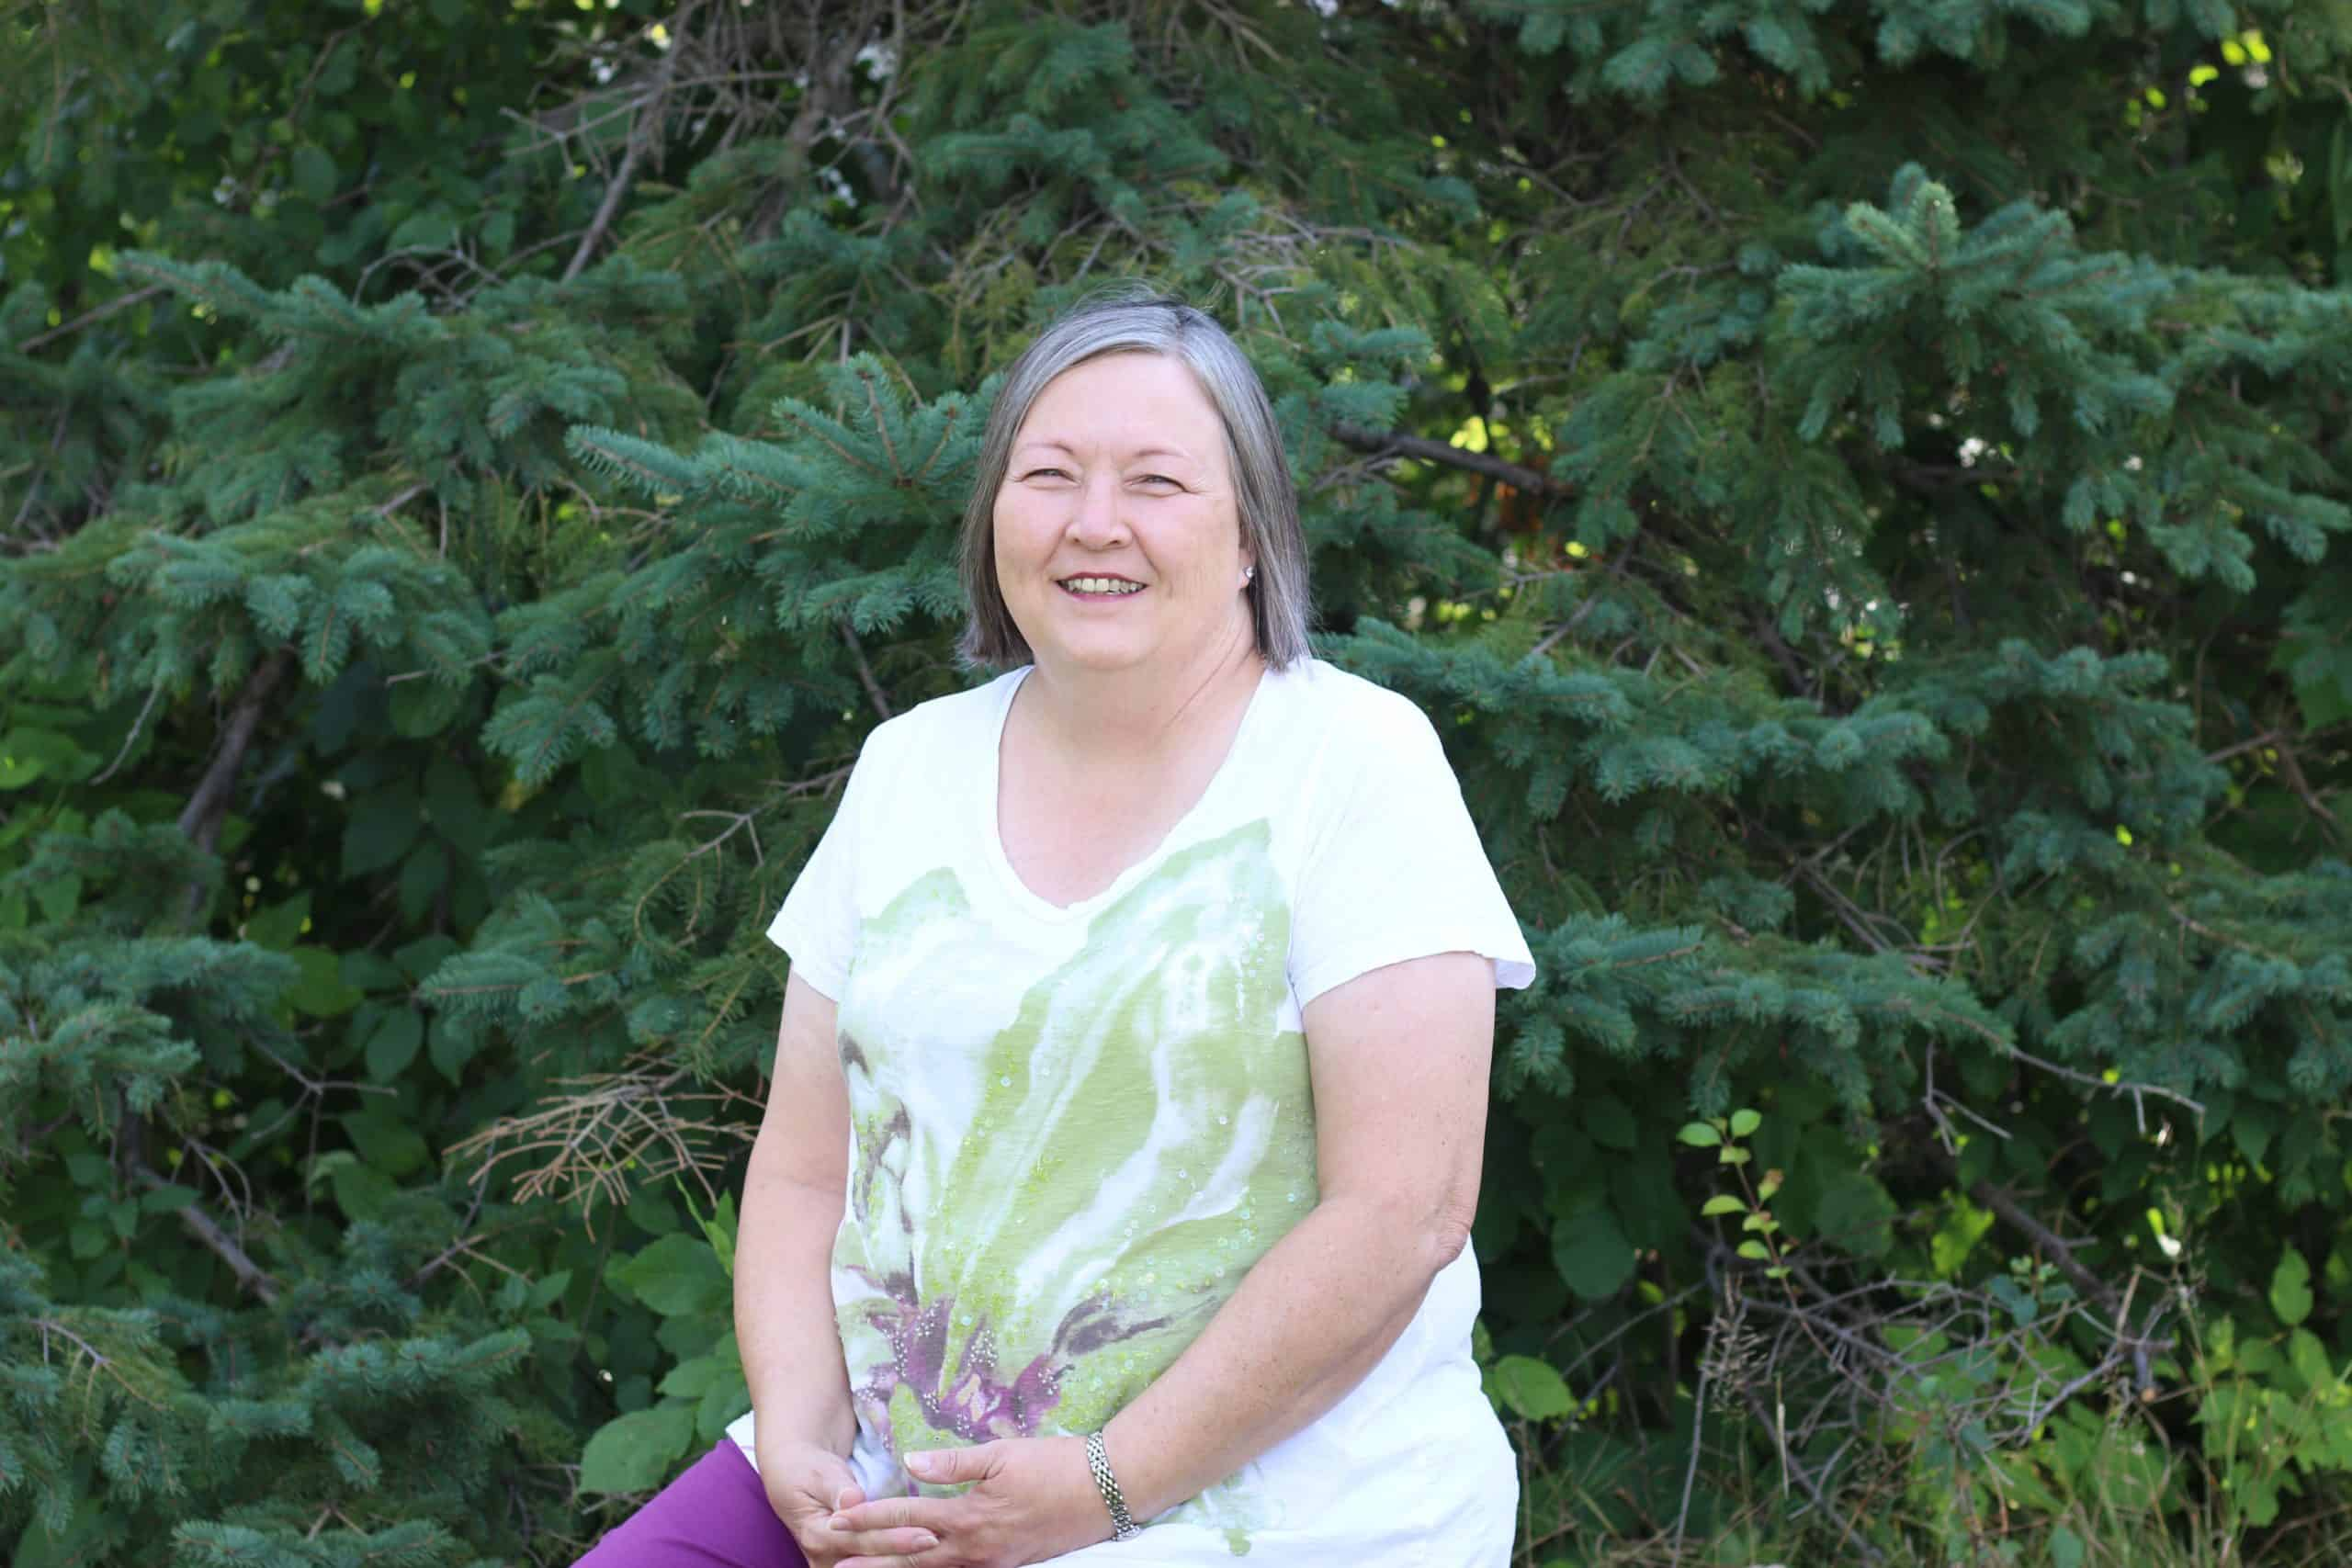 Julie Radomsky